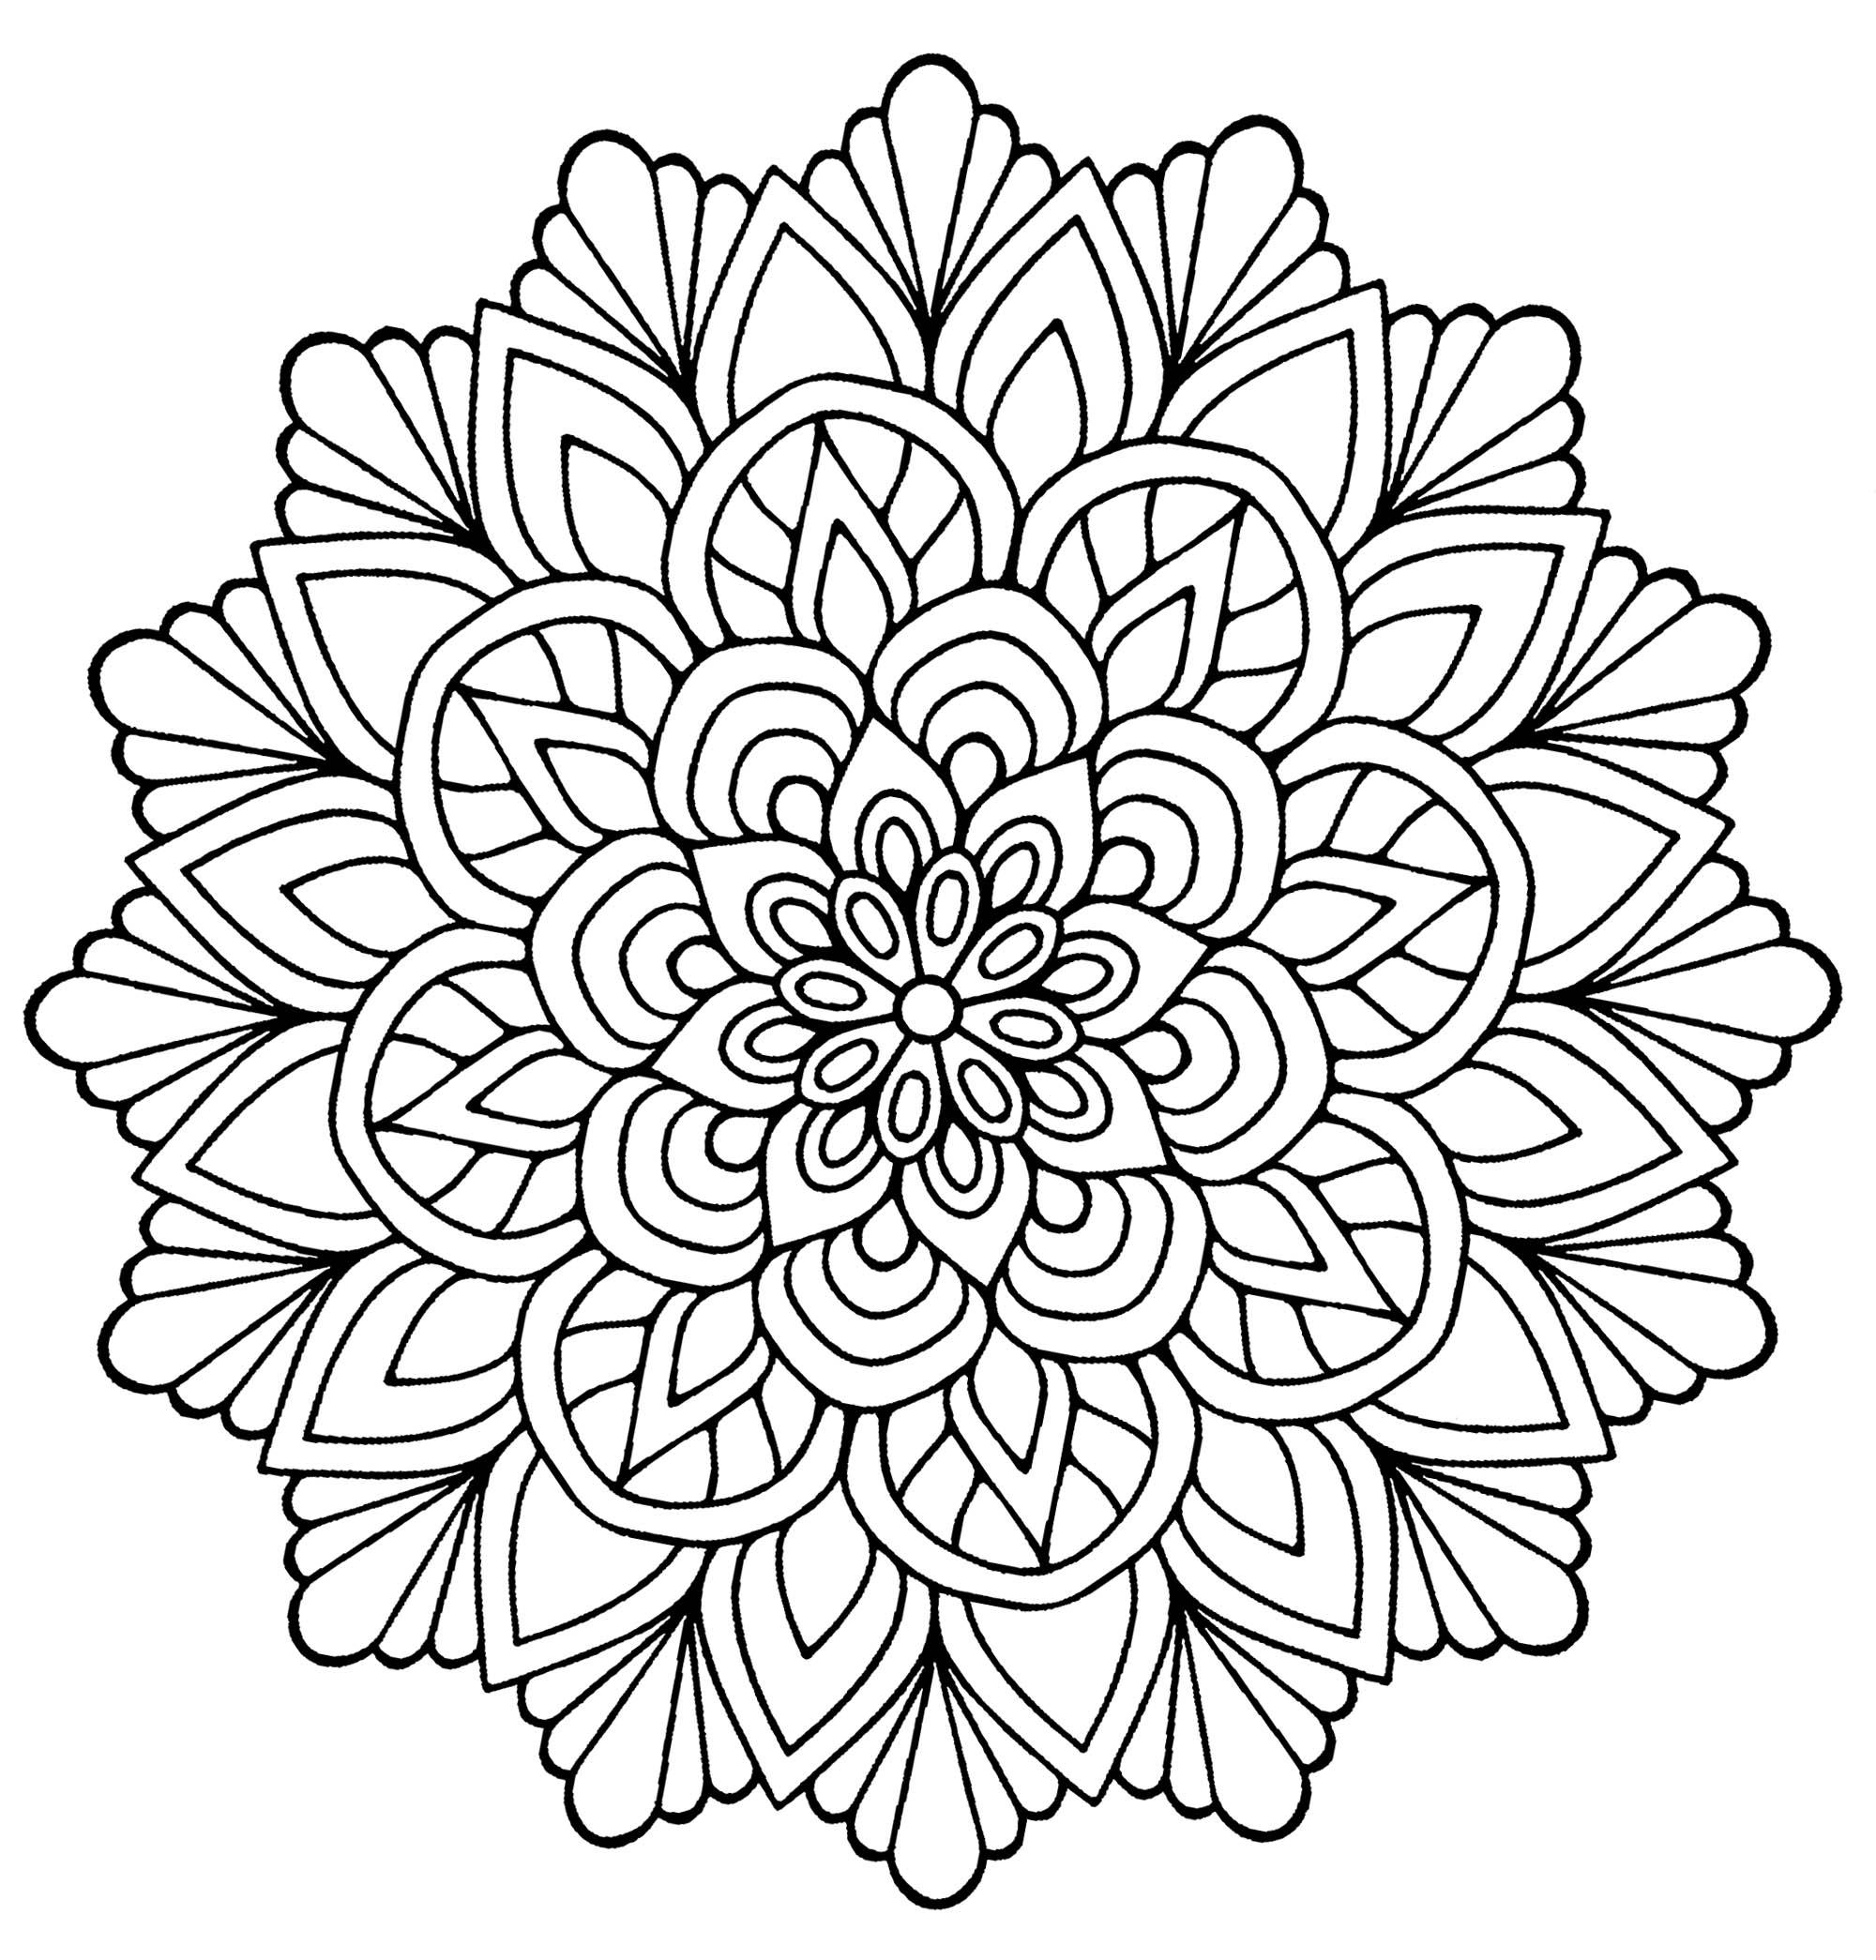 Flower Mandala Printable Coloring Pages